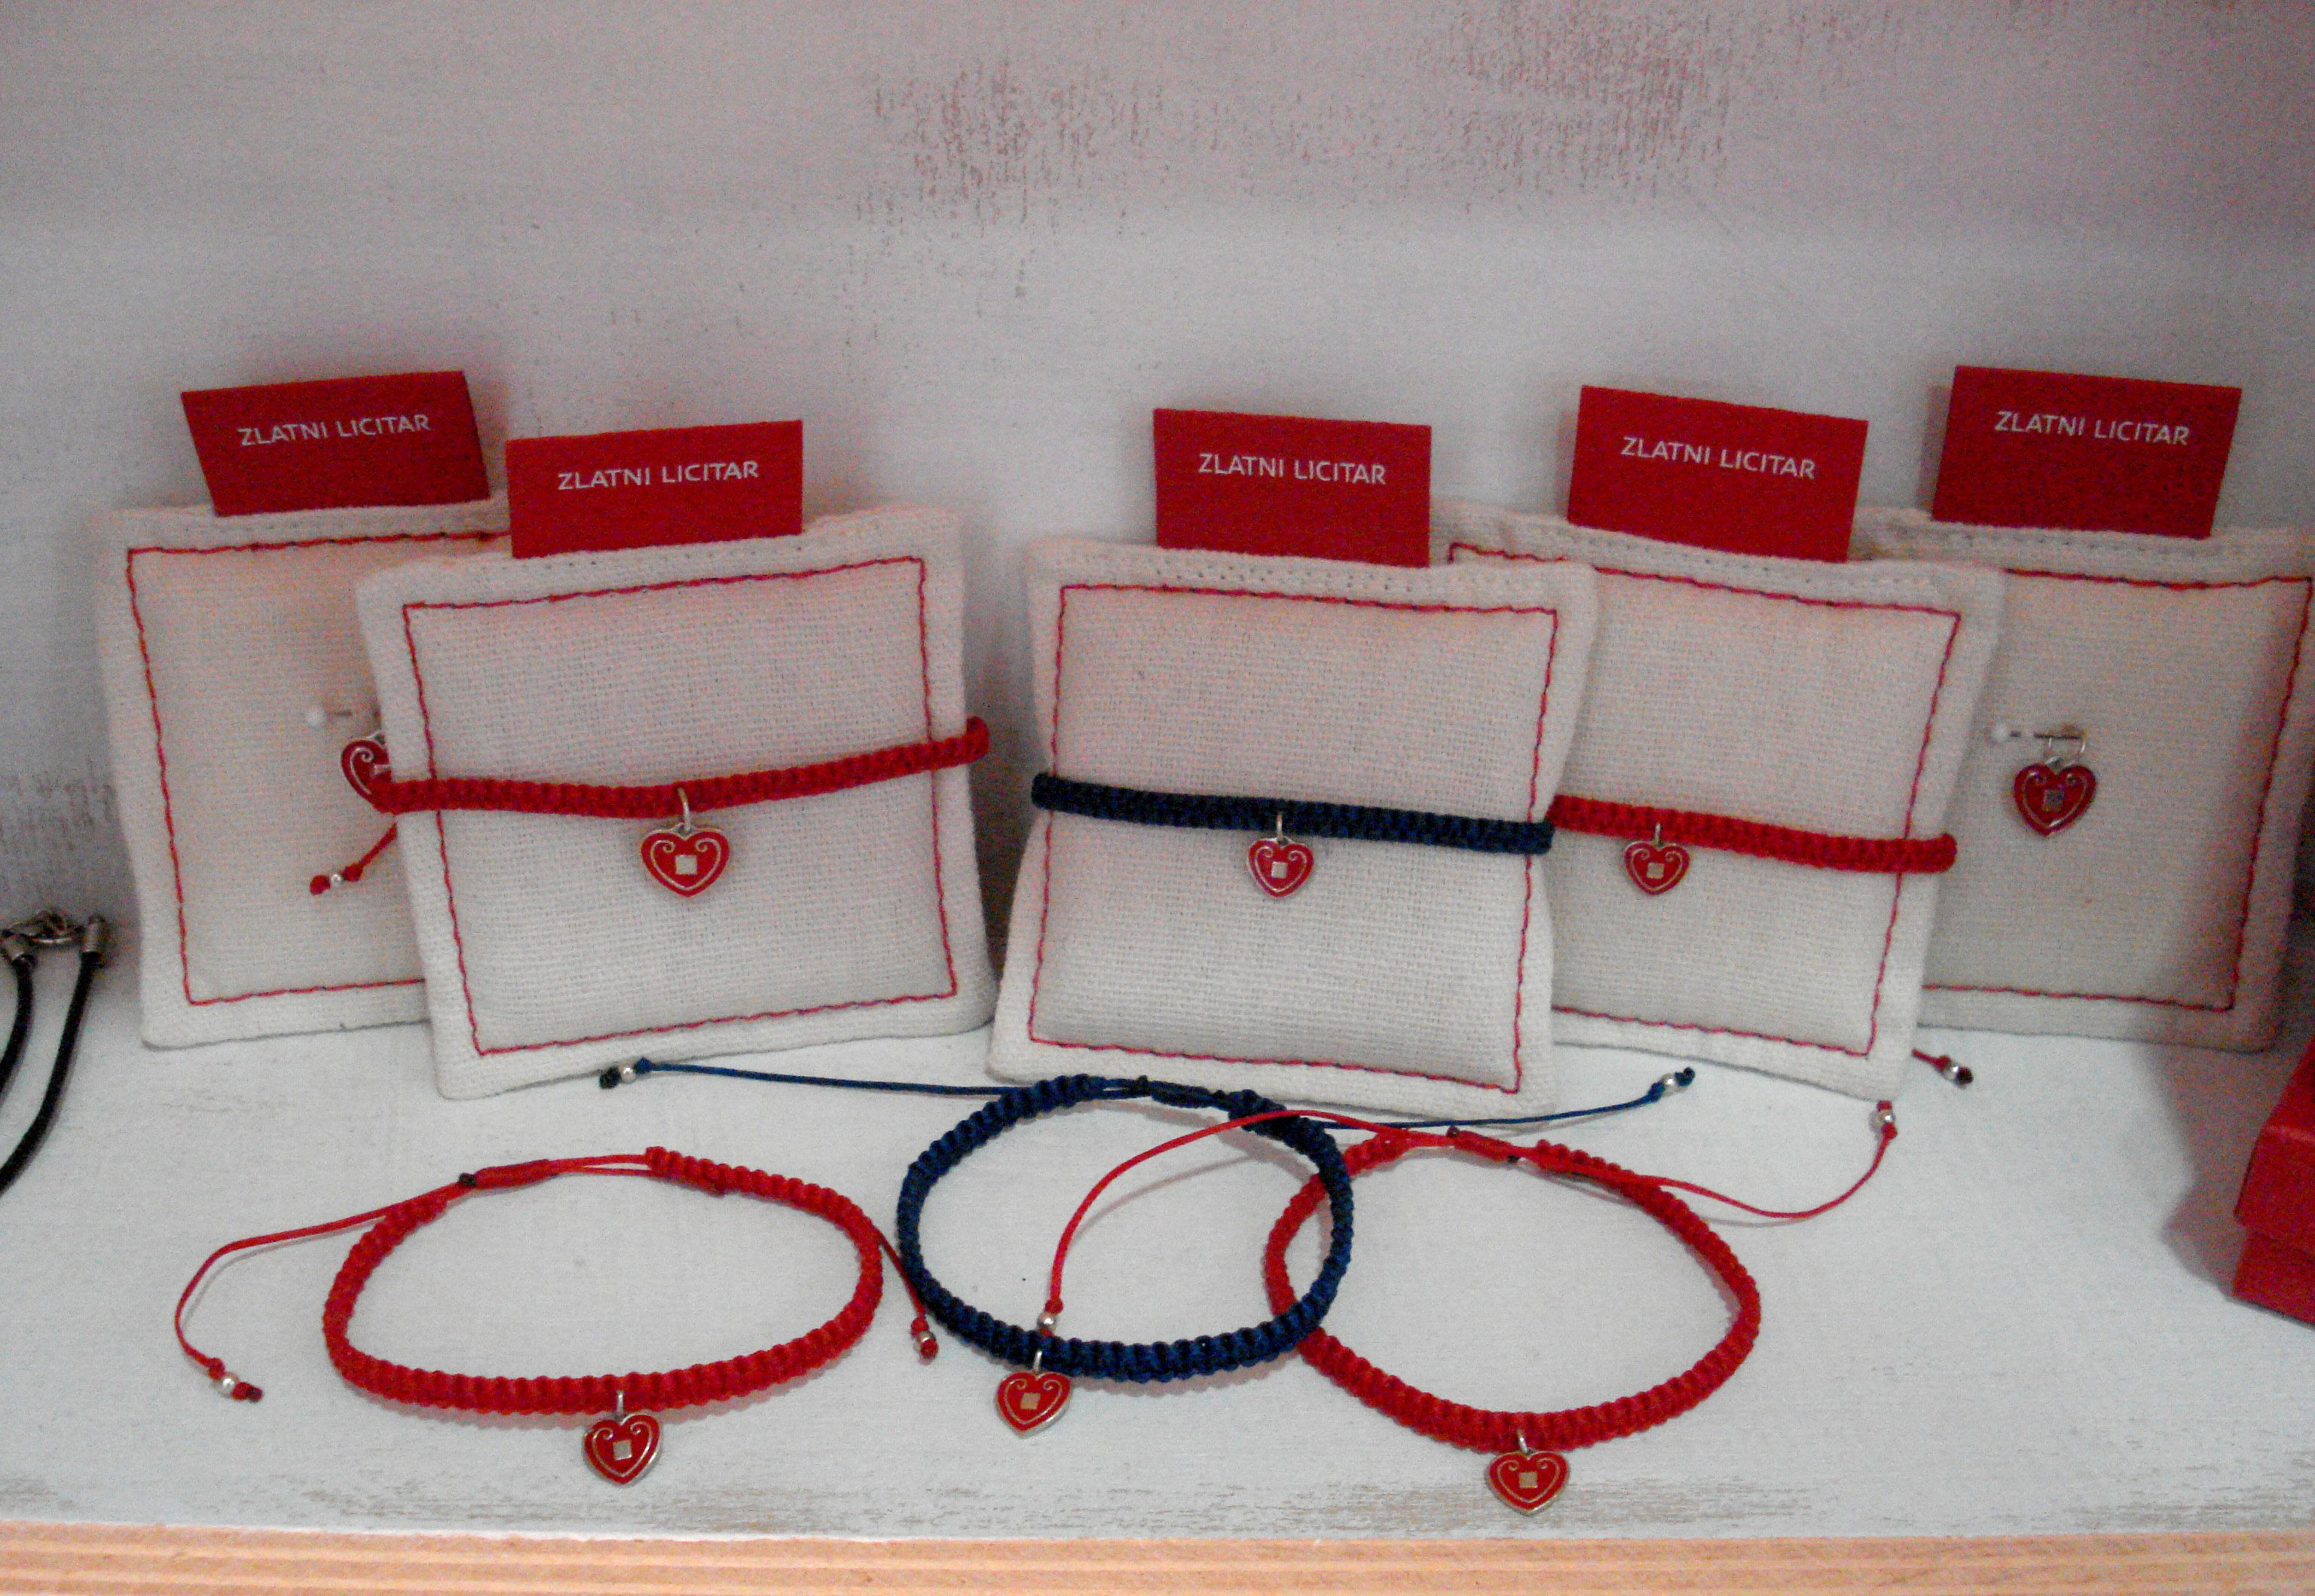 ZLATNI LICITAR #bracelets available in Take me Home #croatian design shop. www.insightdesignguide.com